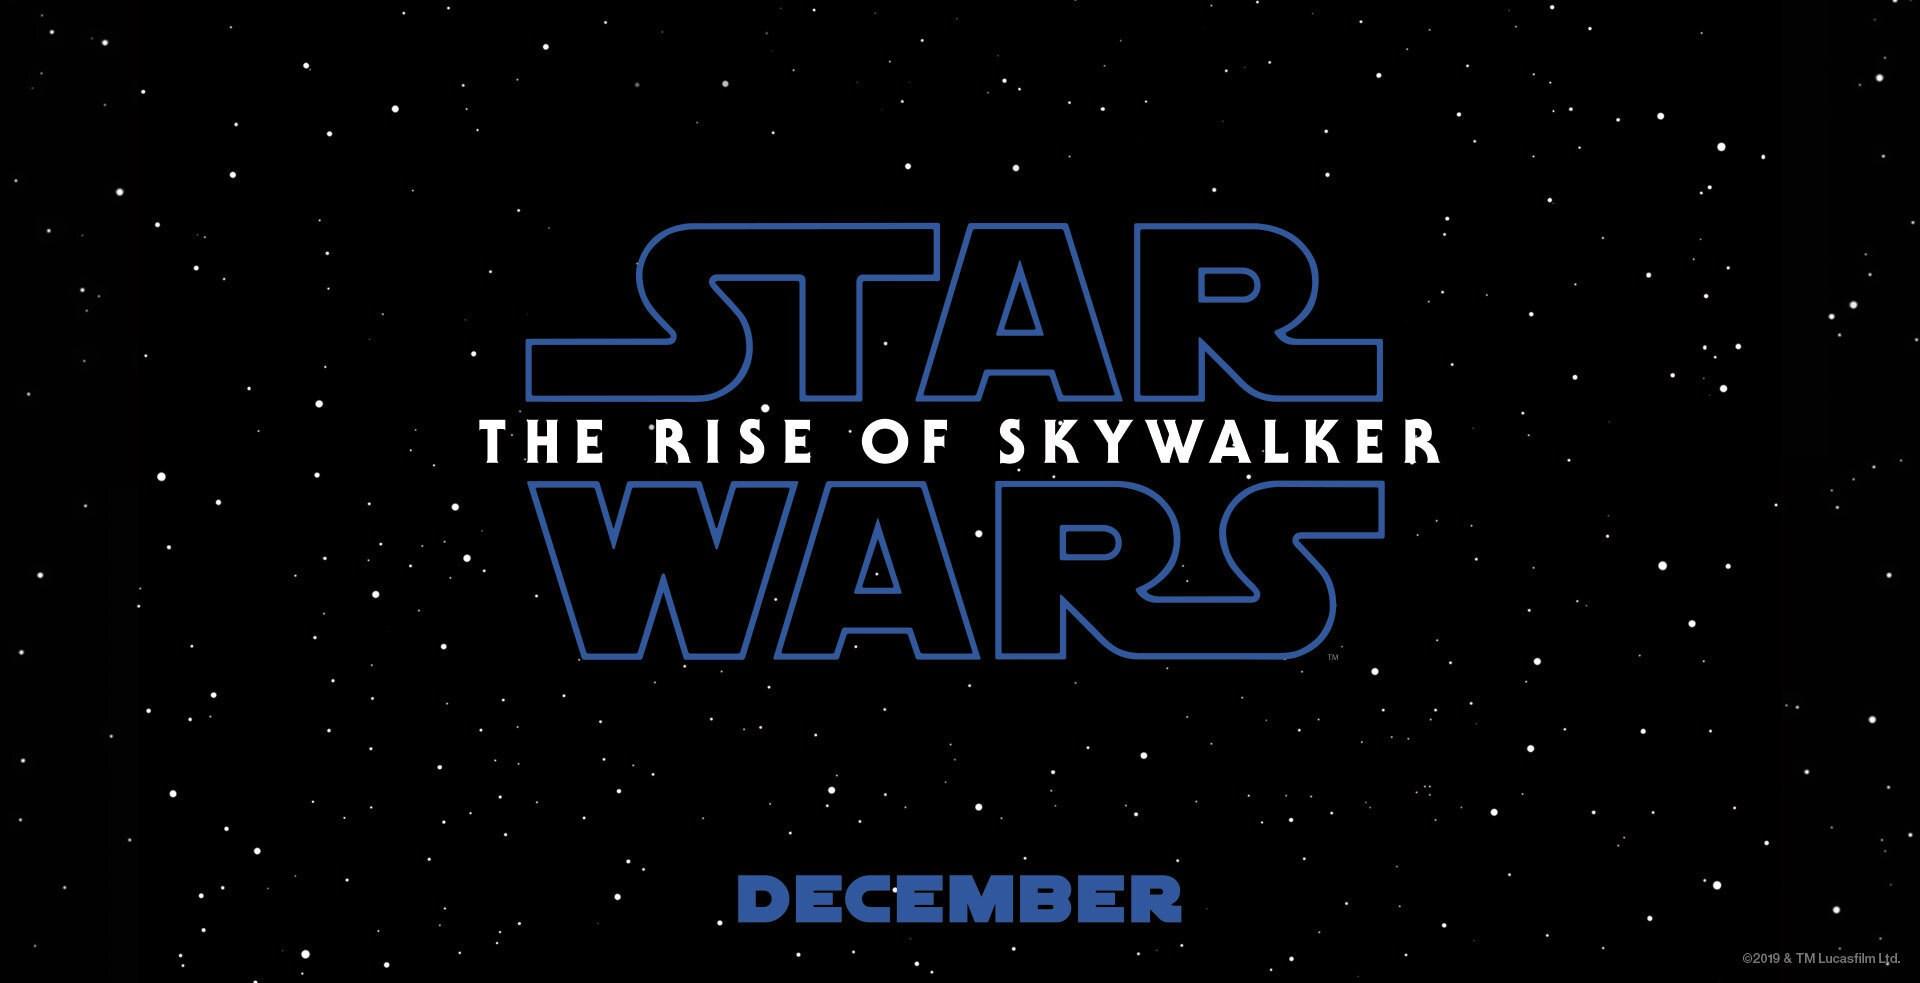 Star Wars Episode IX: The Rise of Luke Skywalker - Banner Hero Object